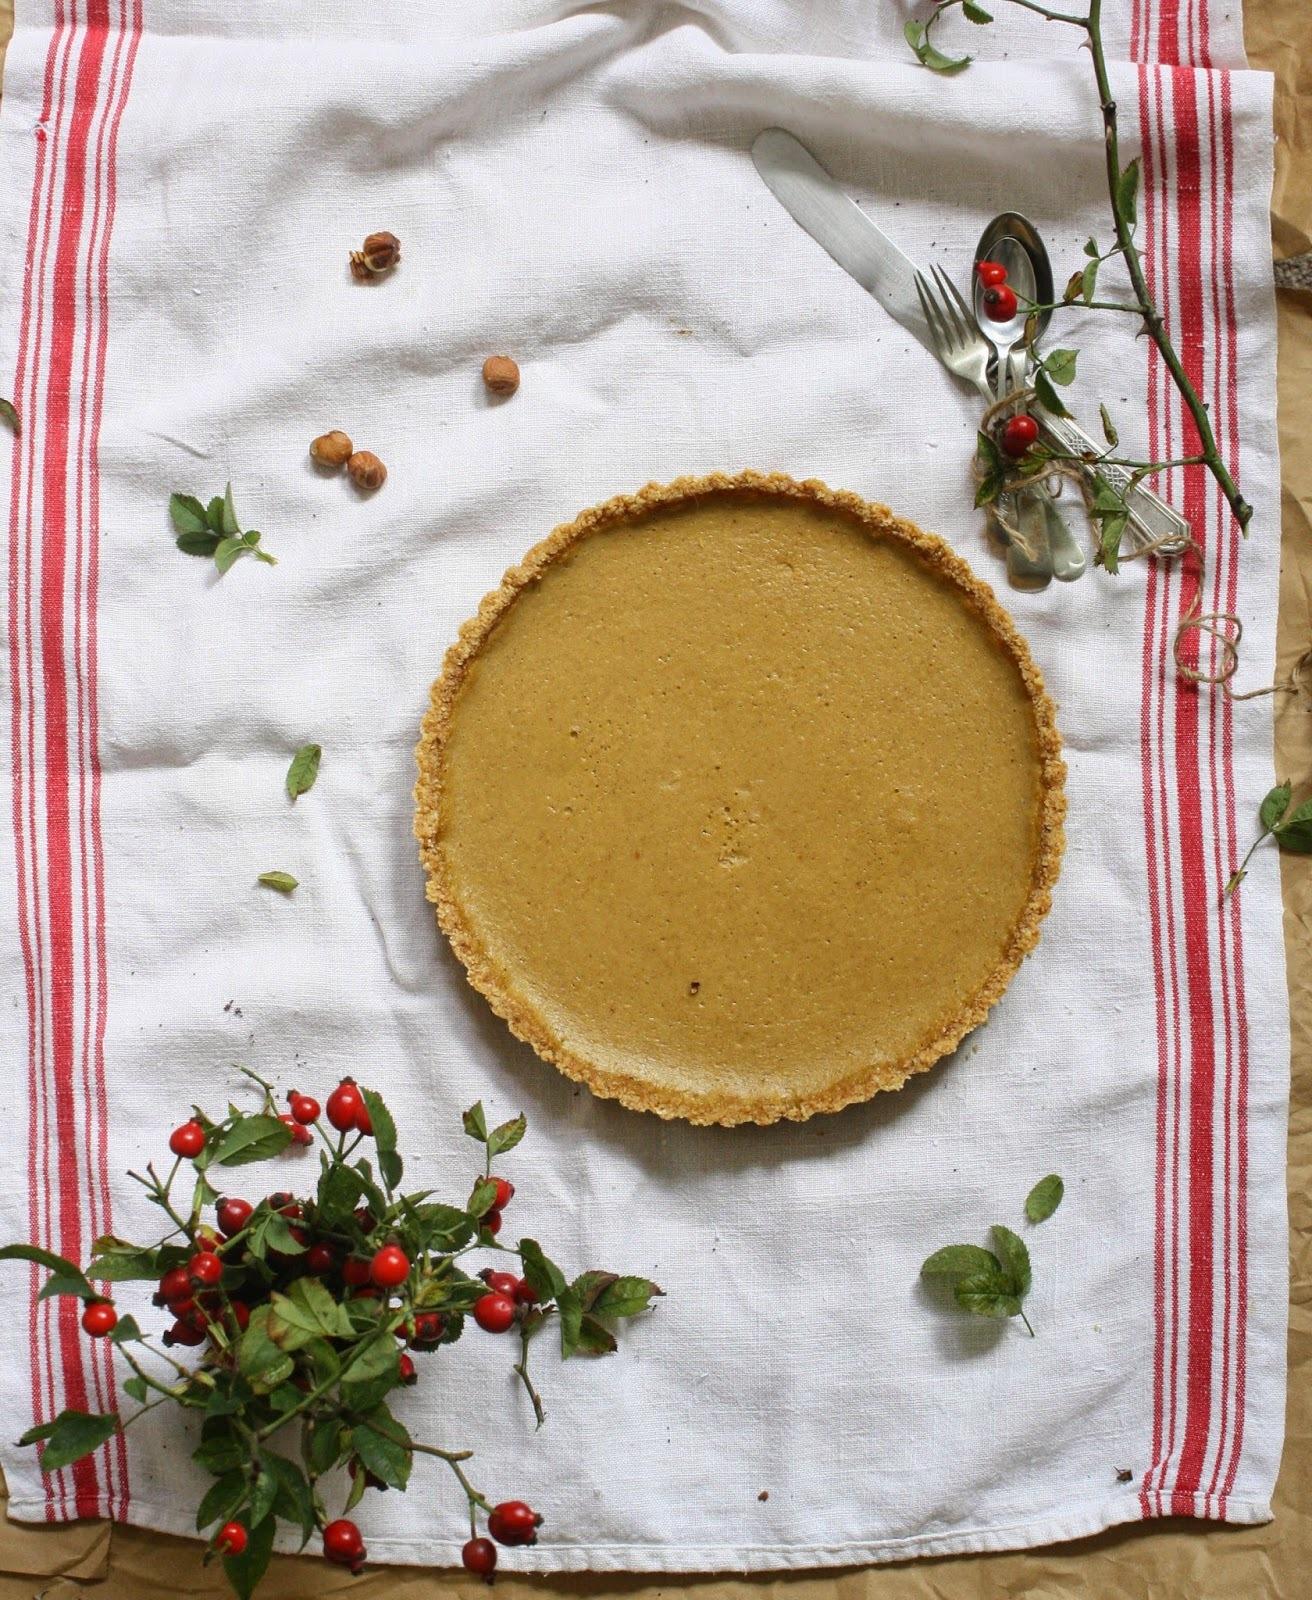 Delicate Pumpkin Pie. Jemnučký tekvicový koláč.